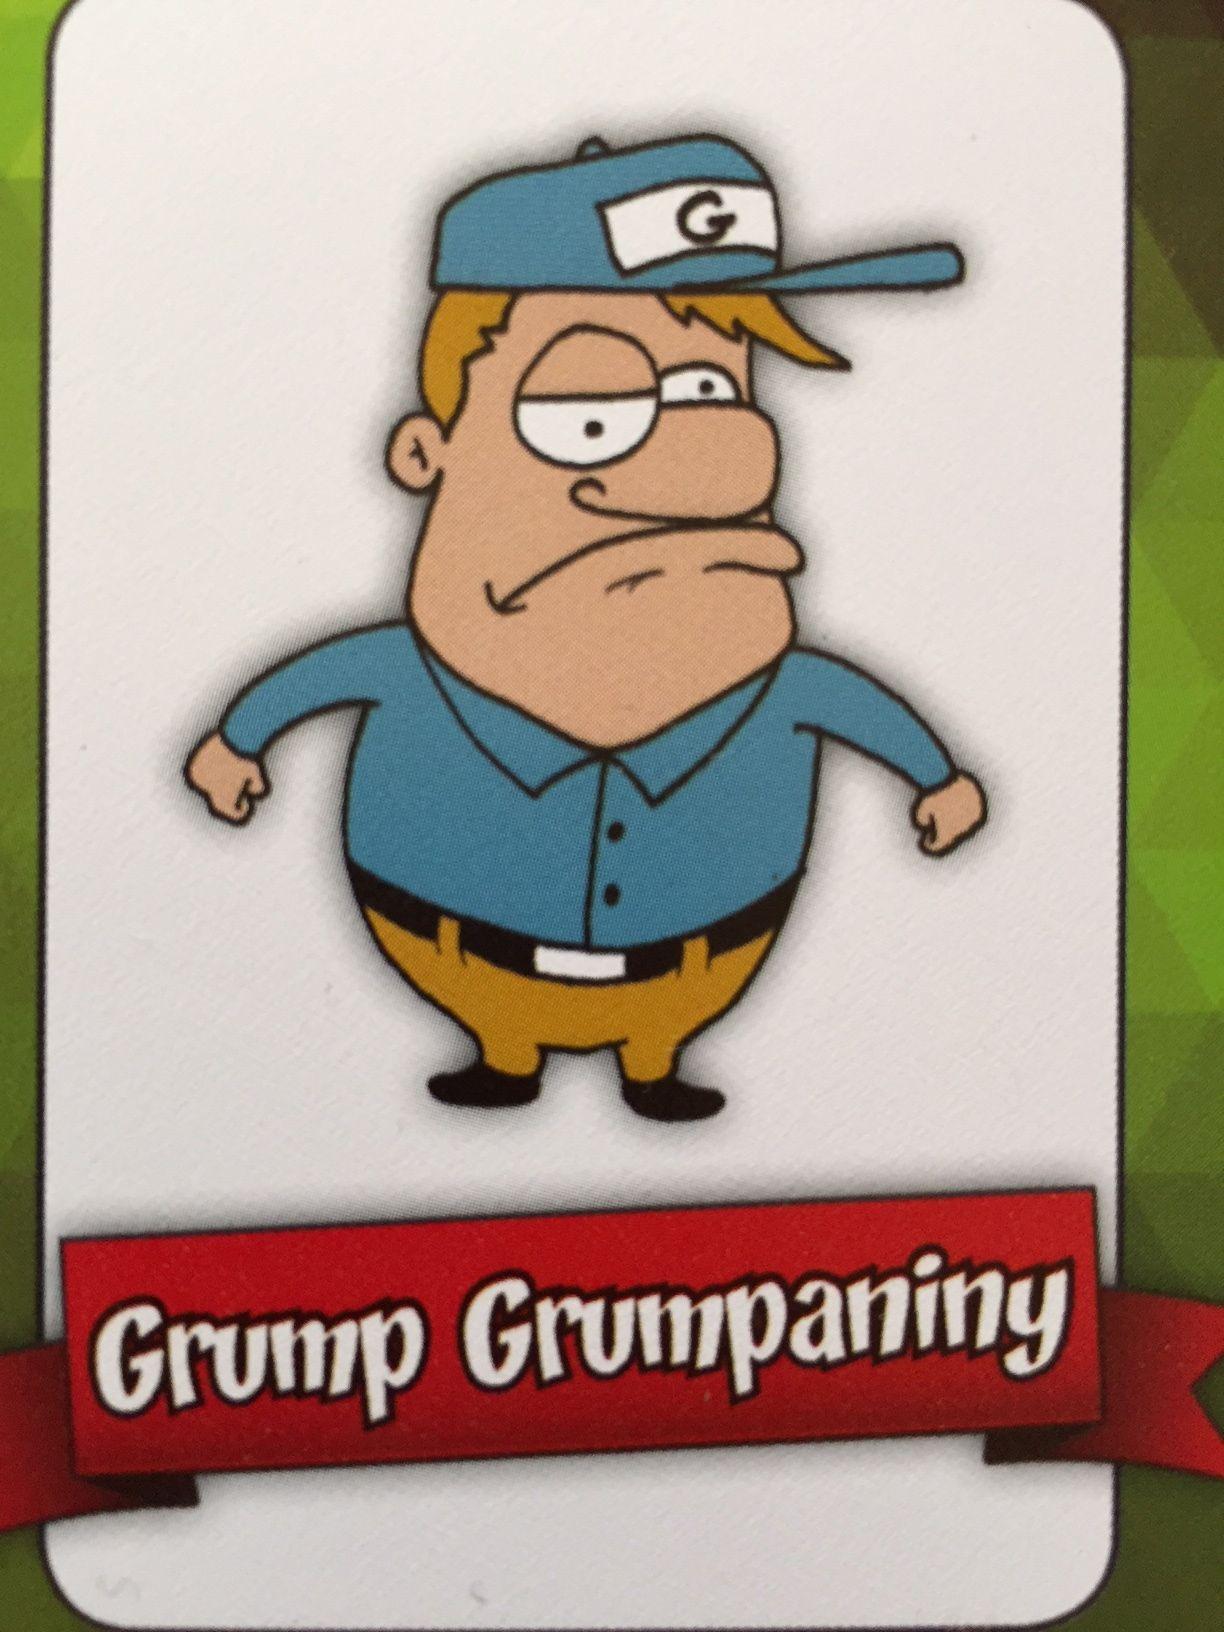 Grumpy Grumpaniny I Put People In Grumpy Moods